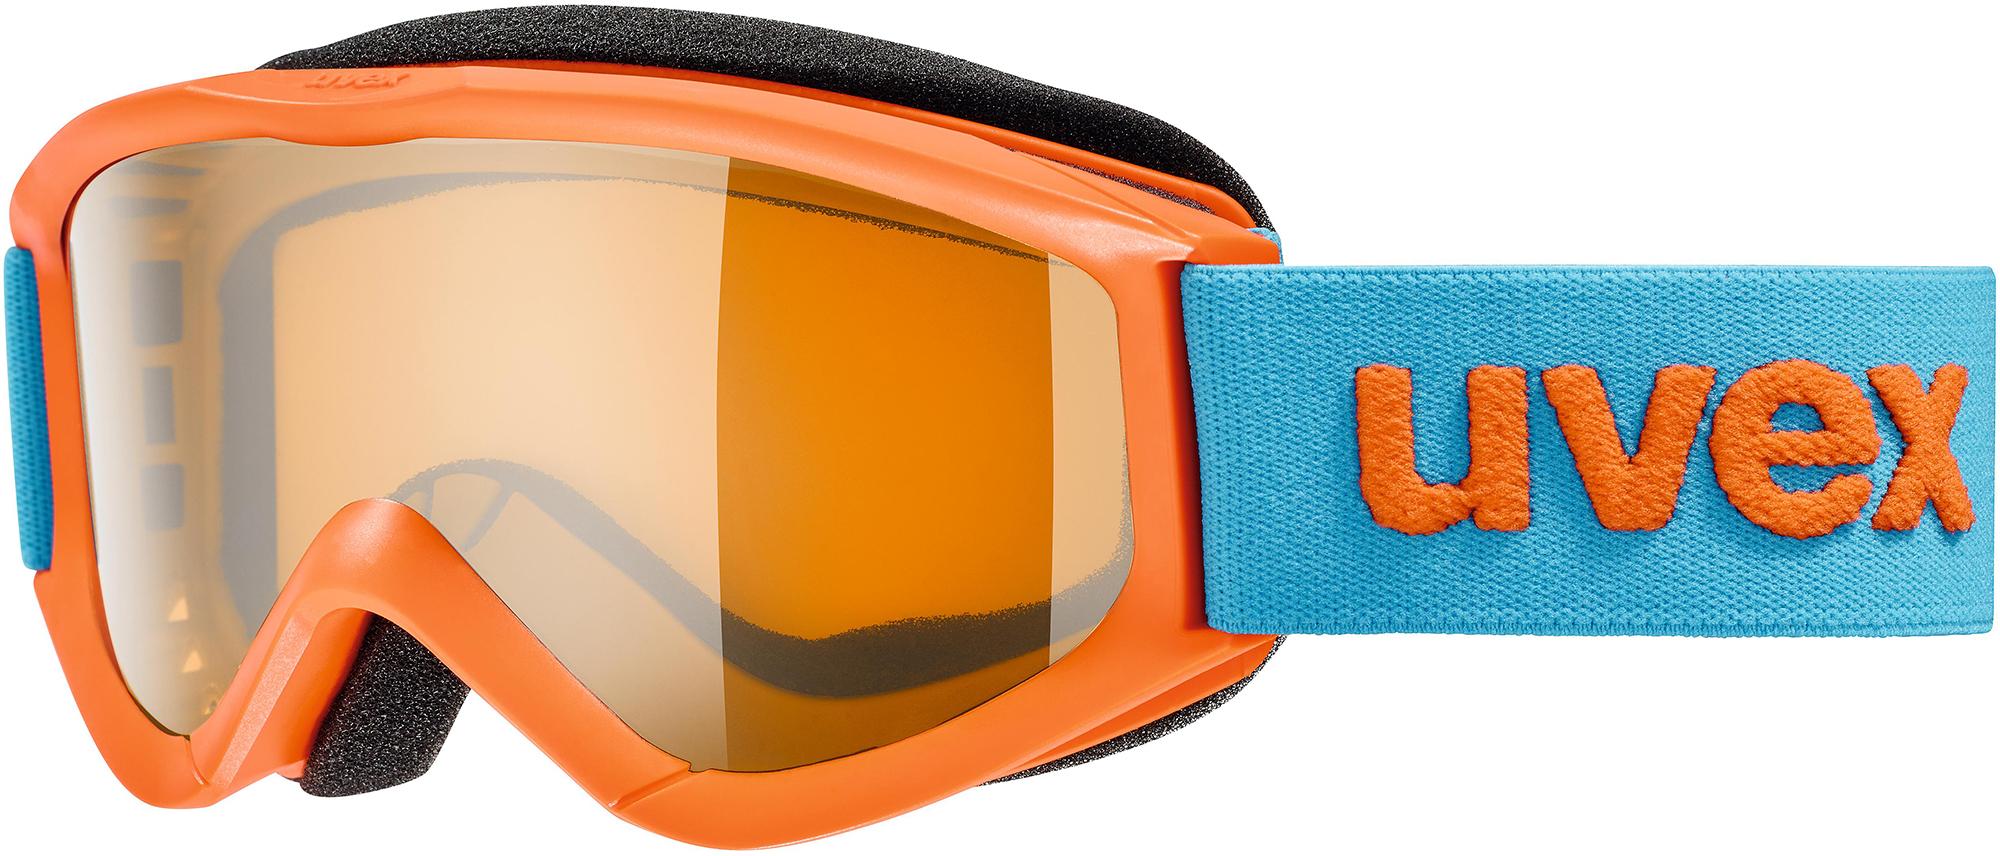 Горнолыжные маски UVEX - каталог цен 28bd4b2ee2316